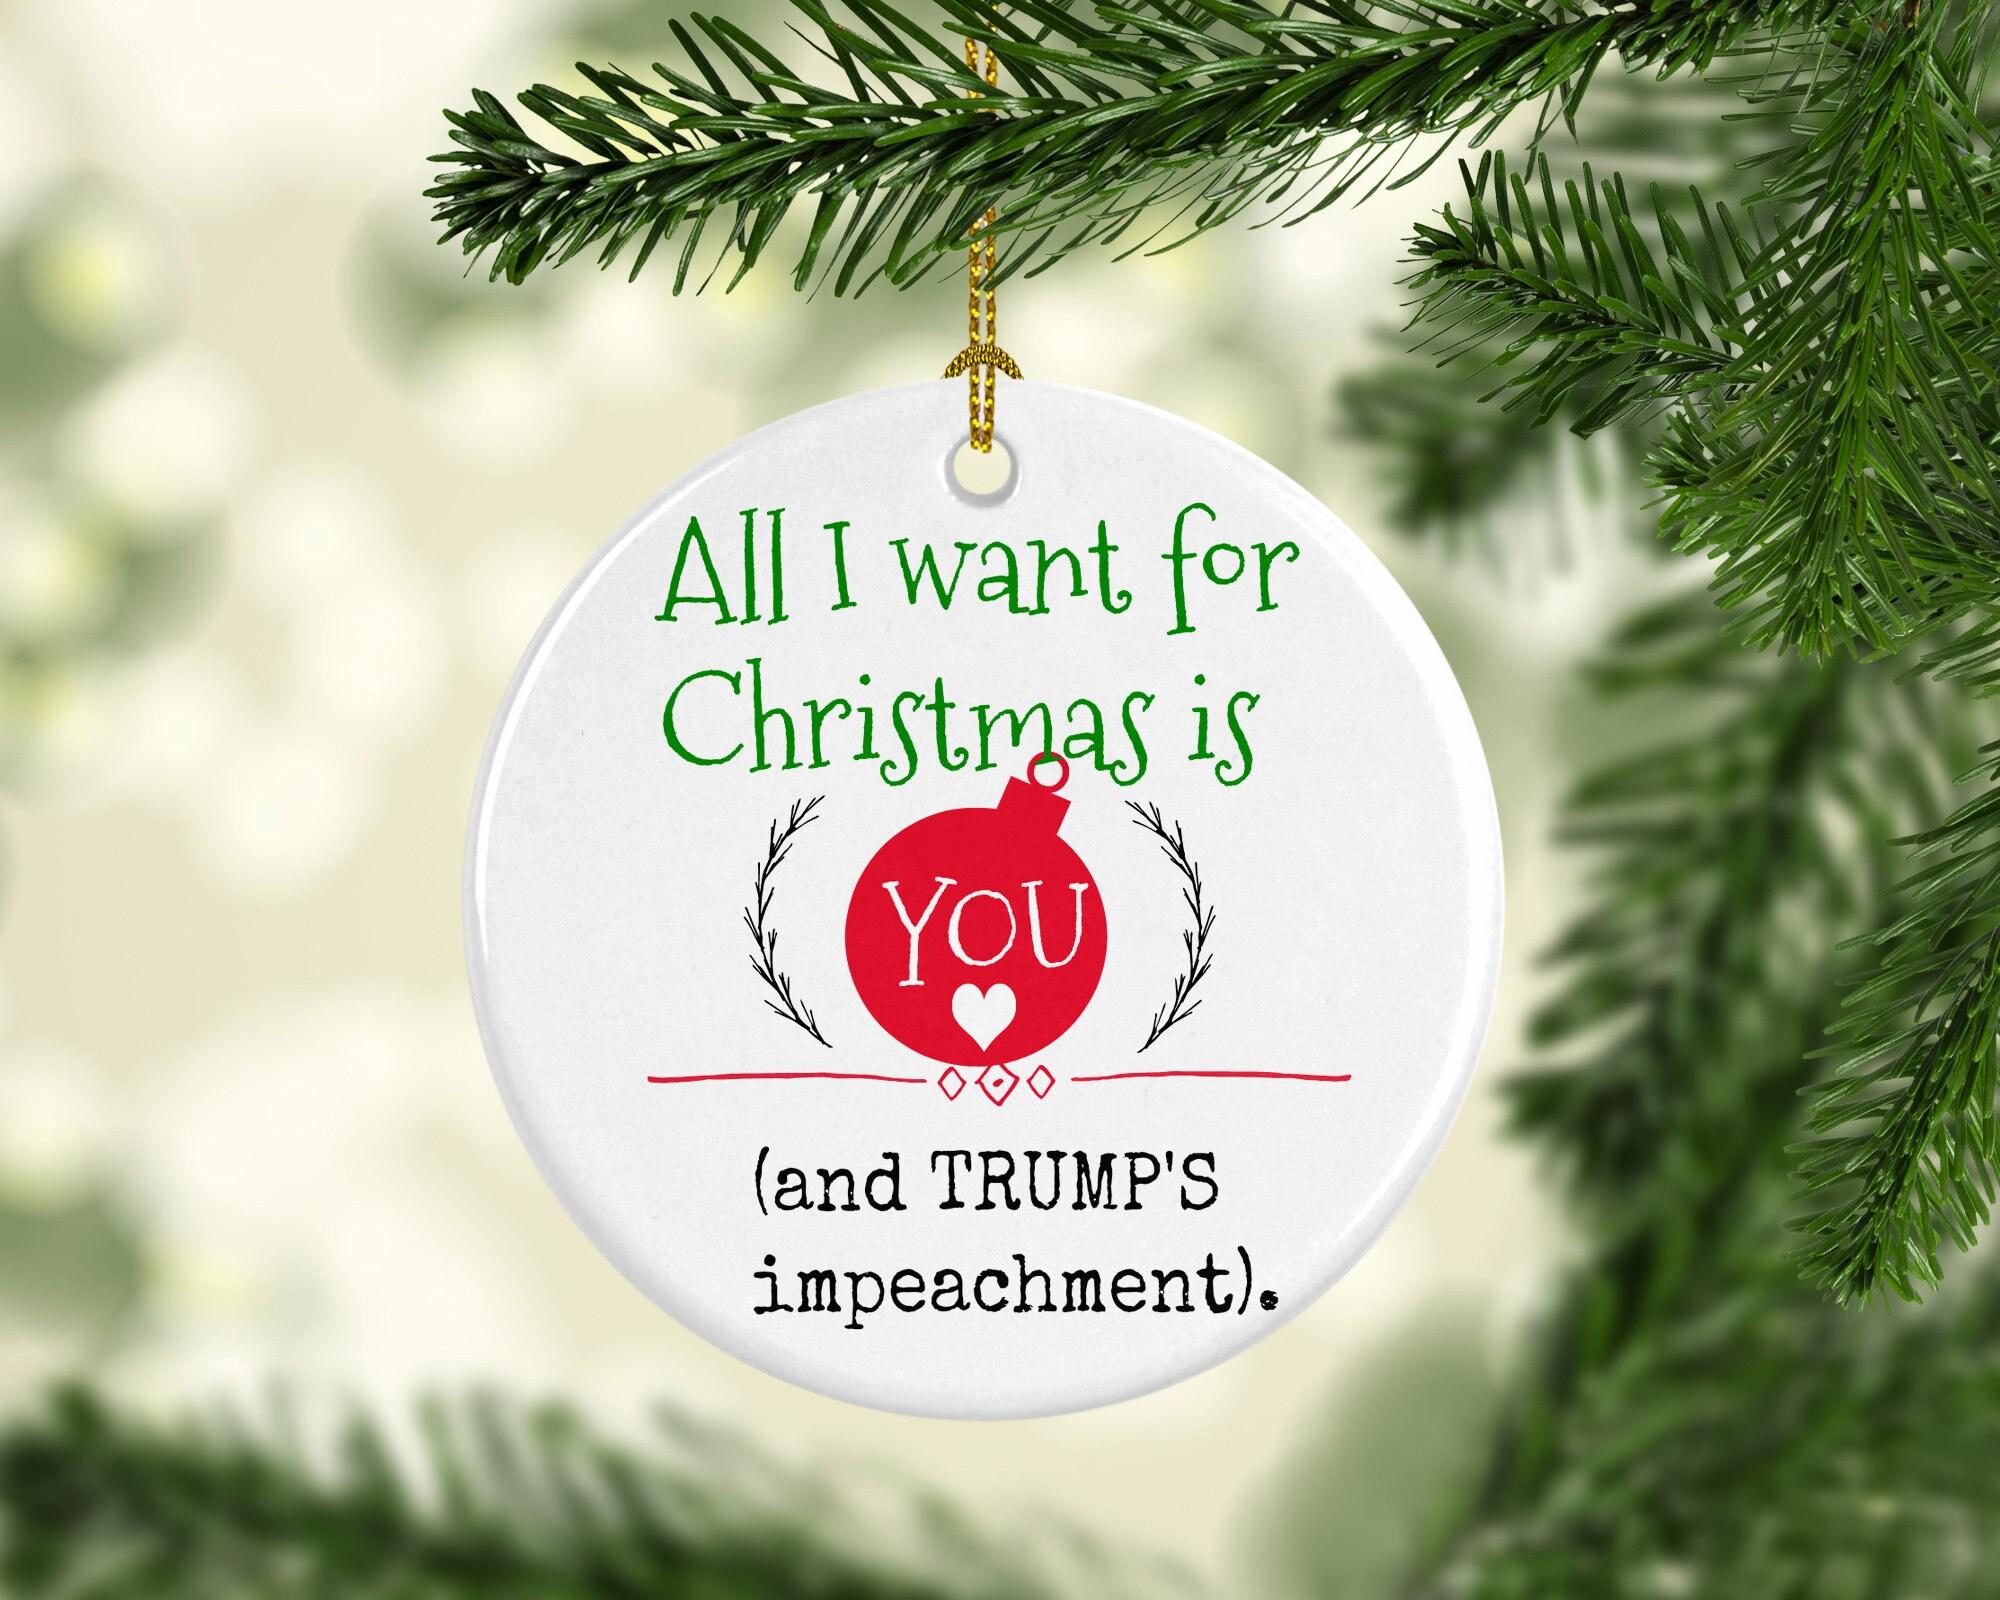 Trump Christmas Trump Ornament Impeach Trump Funny | Etsy